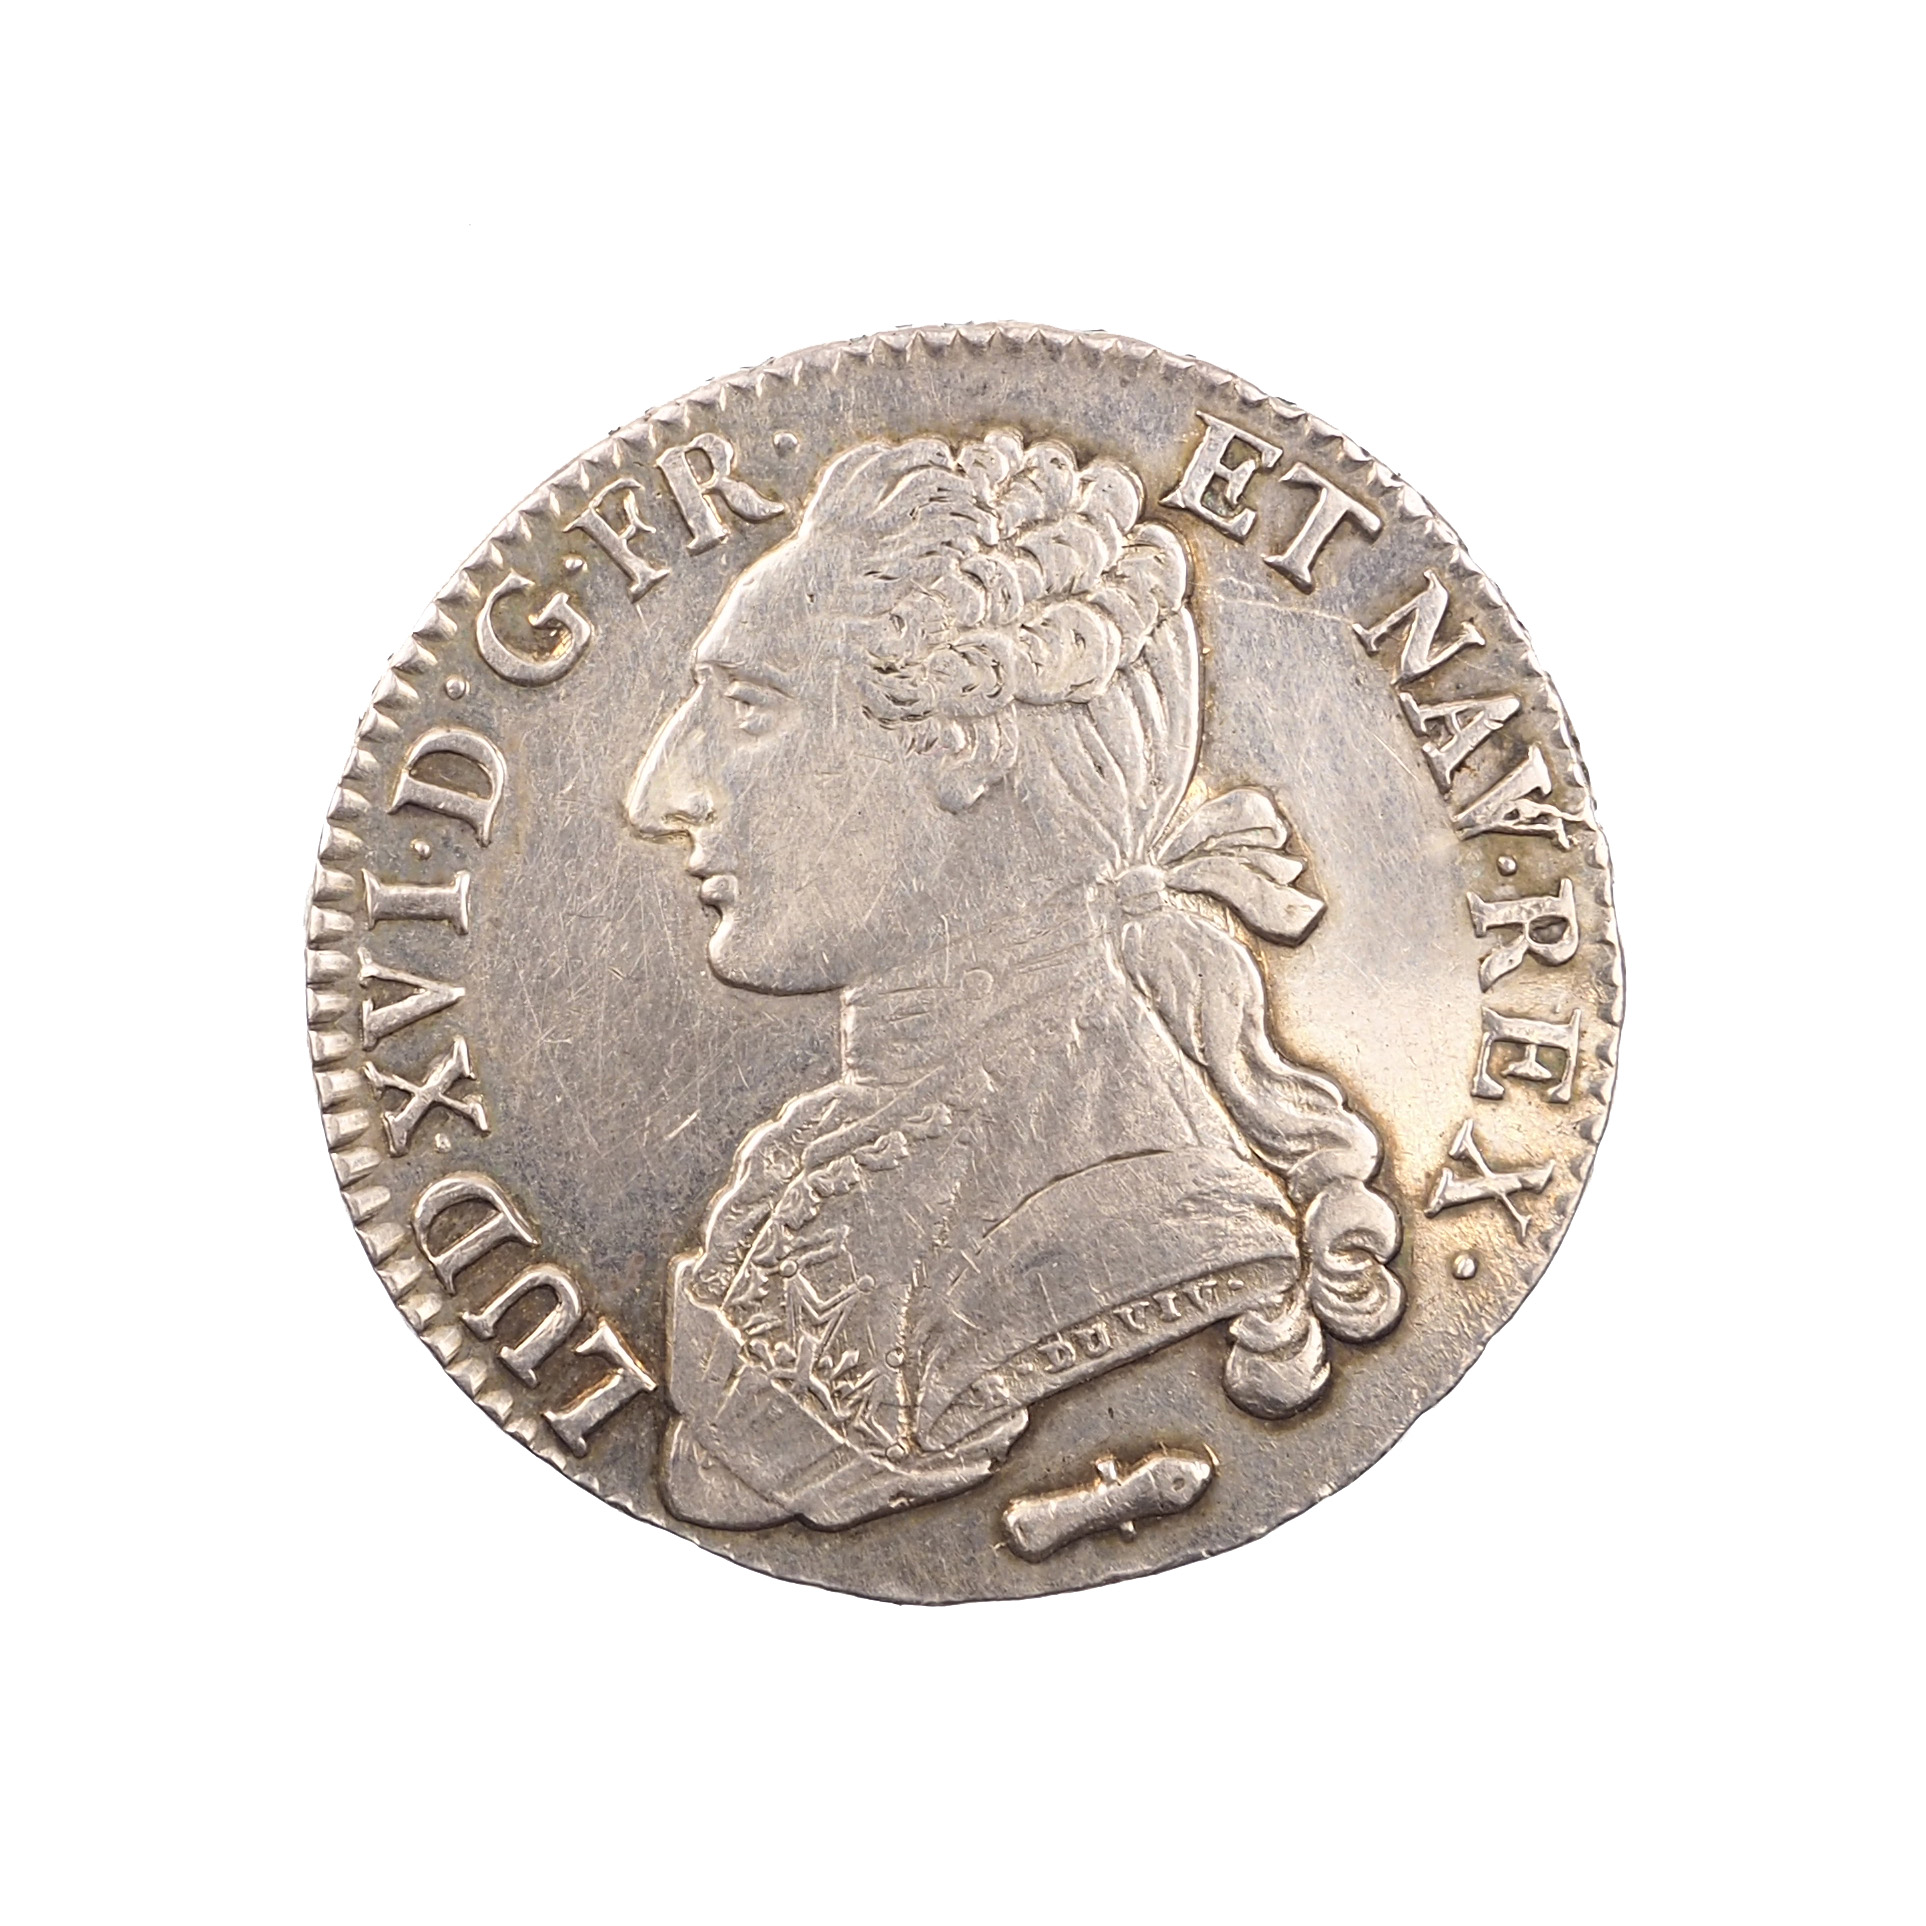 Louis XVI (1774-1792), 1/2 écu 1786 Q Perpignan, TTB+ (nettoyé), Gad. 355